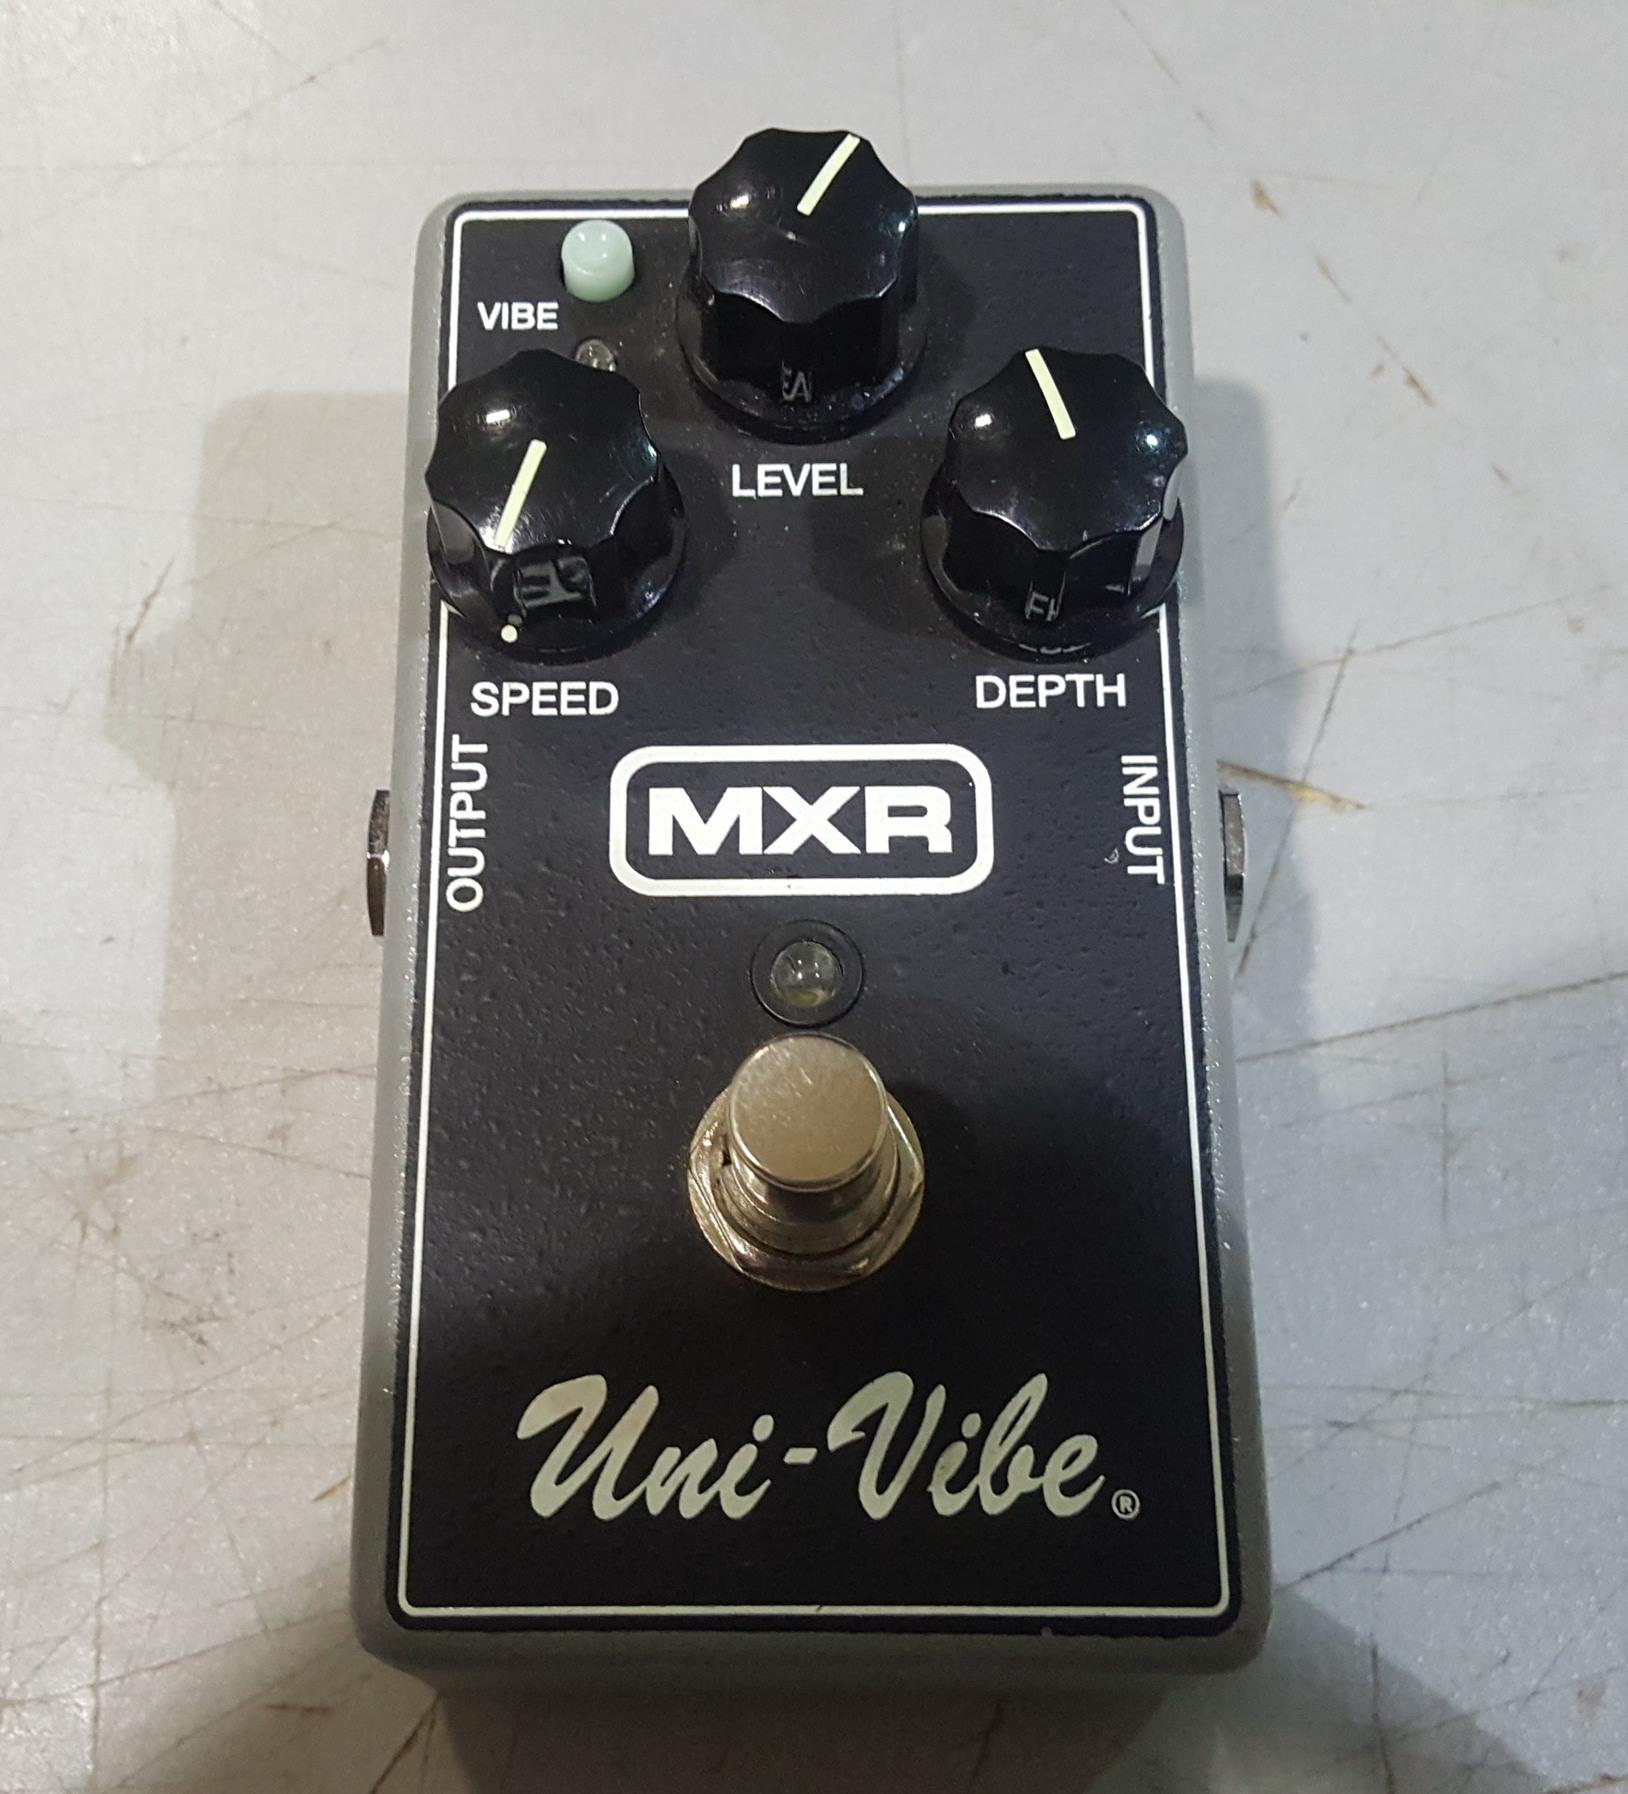 MXR M68 UNI-VIBE CHORUS/VIBRATO Guitar Effects FX Pedal